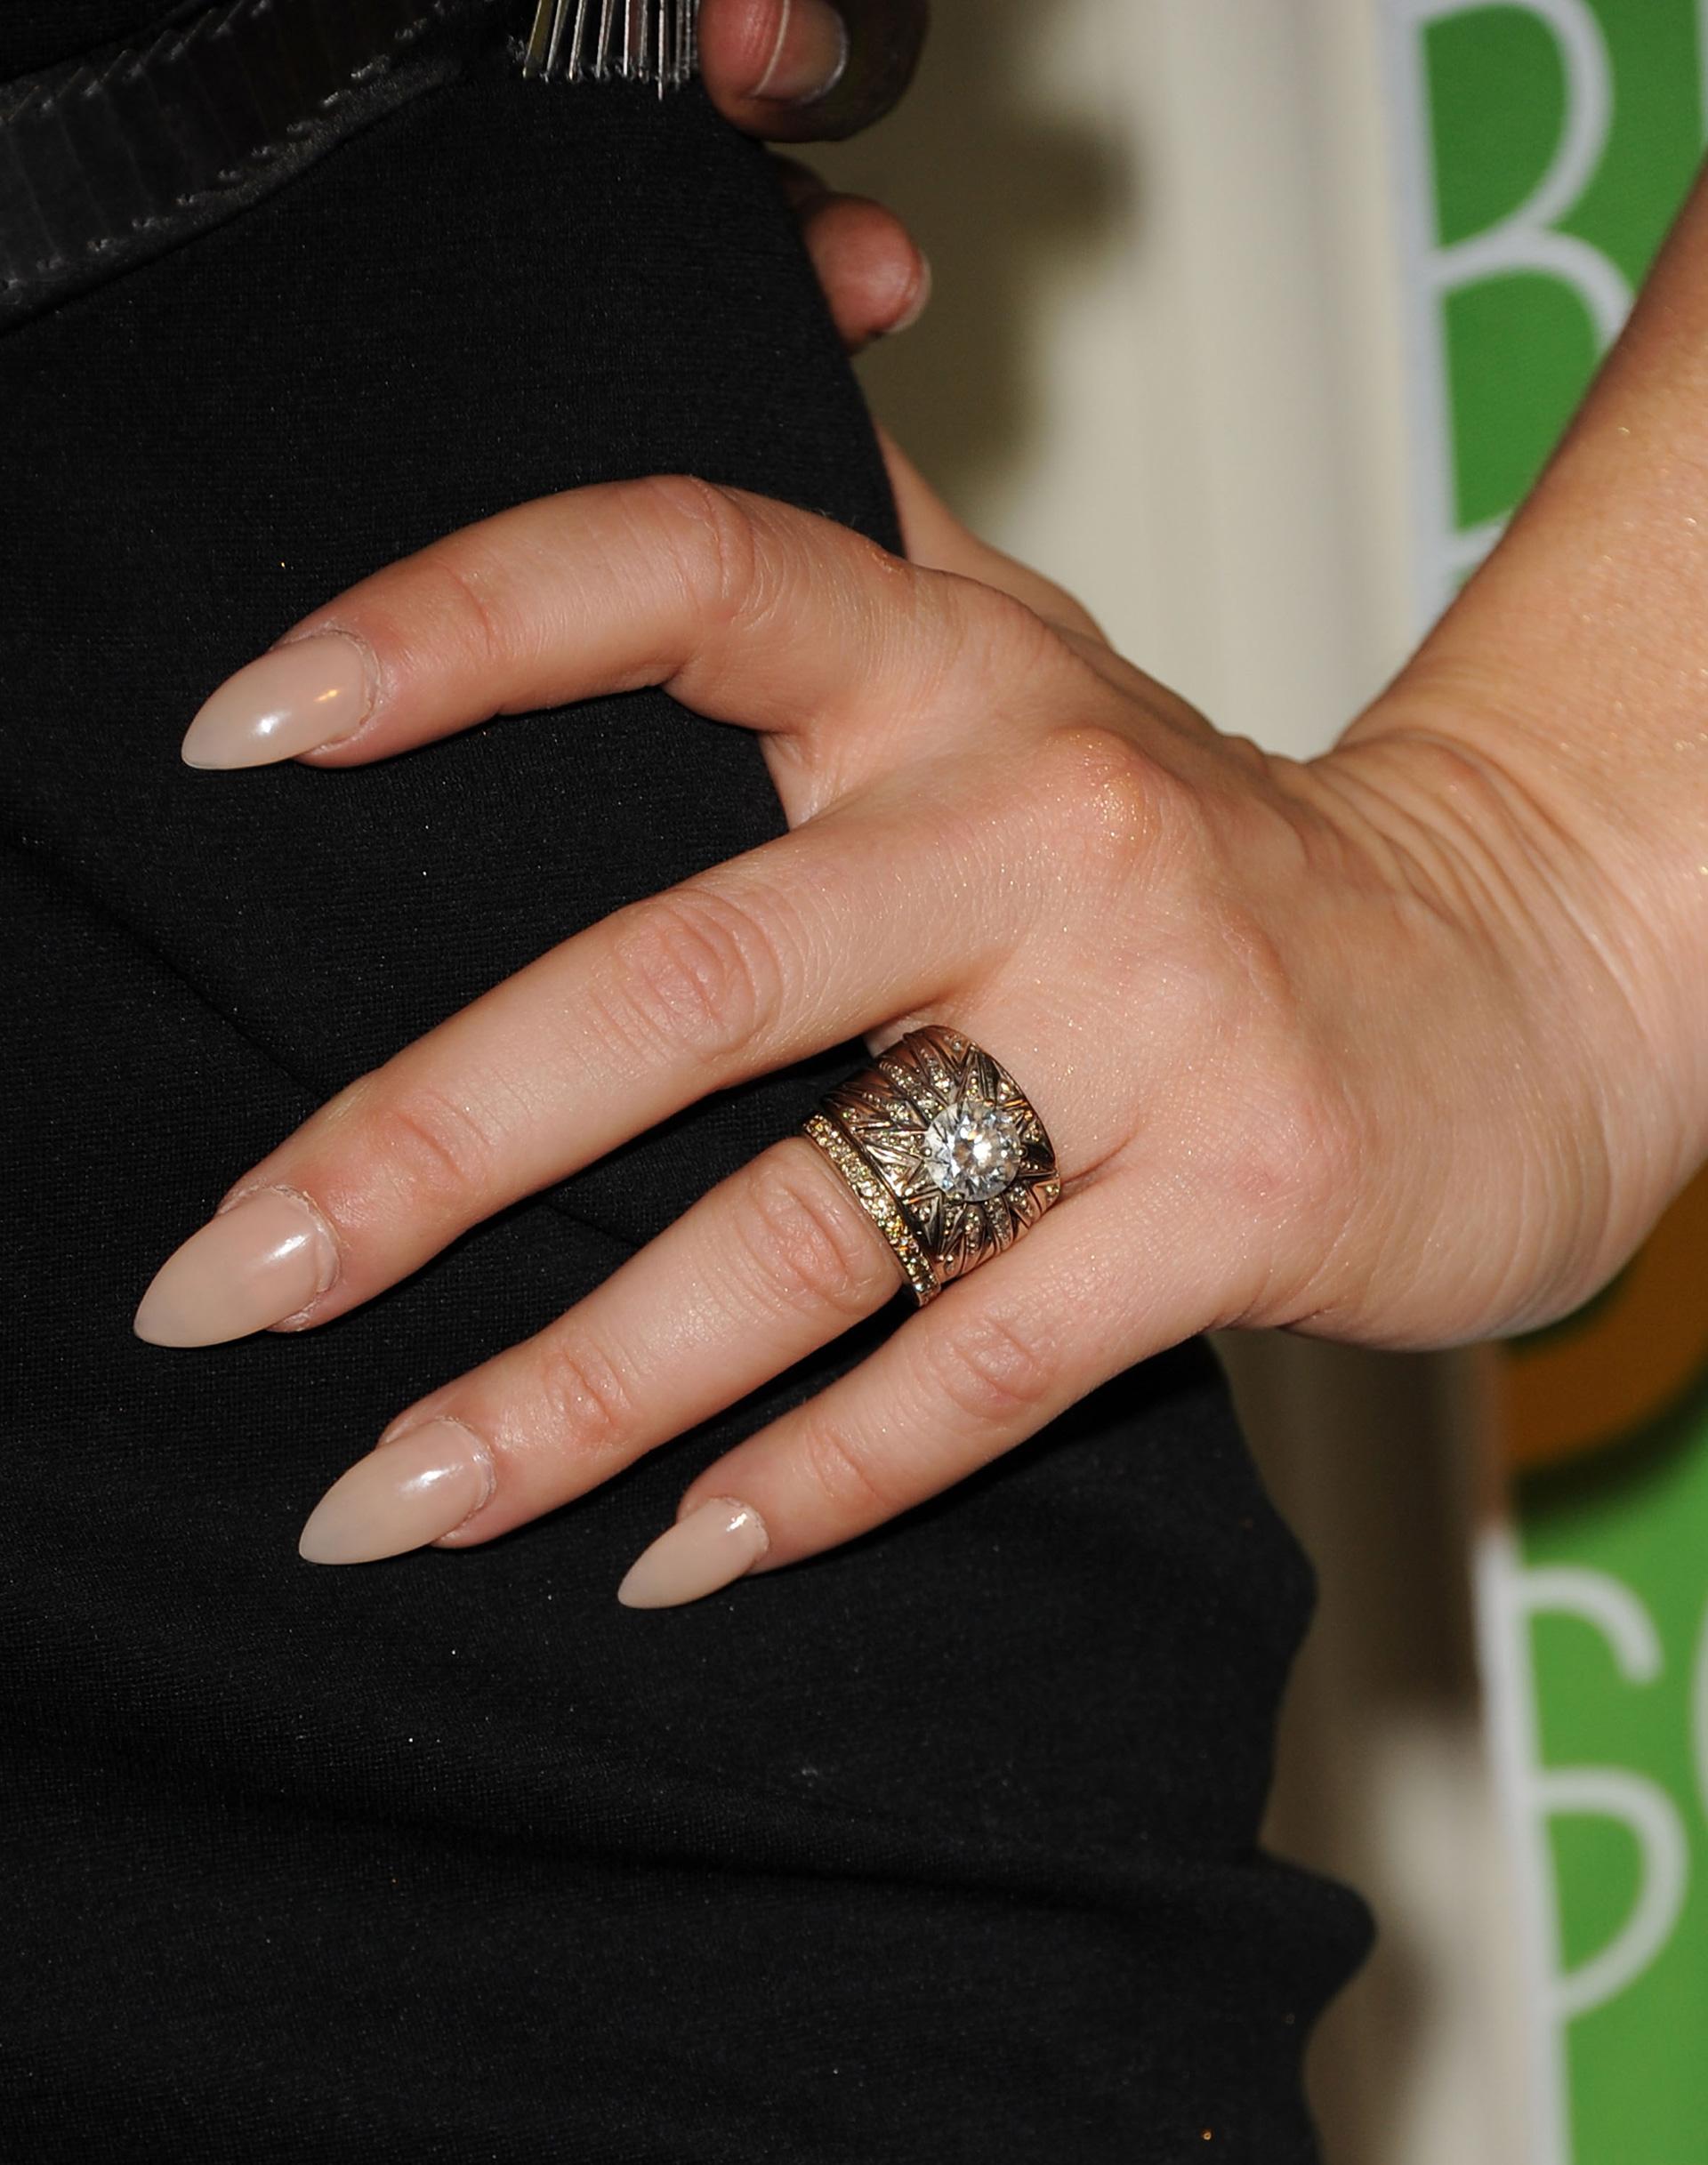 Fergie's stiletto nails